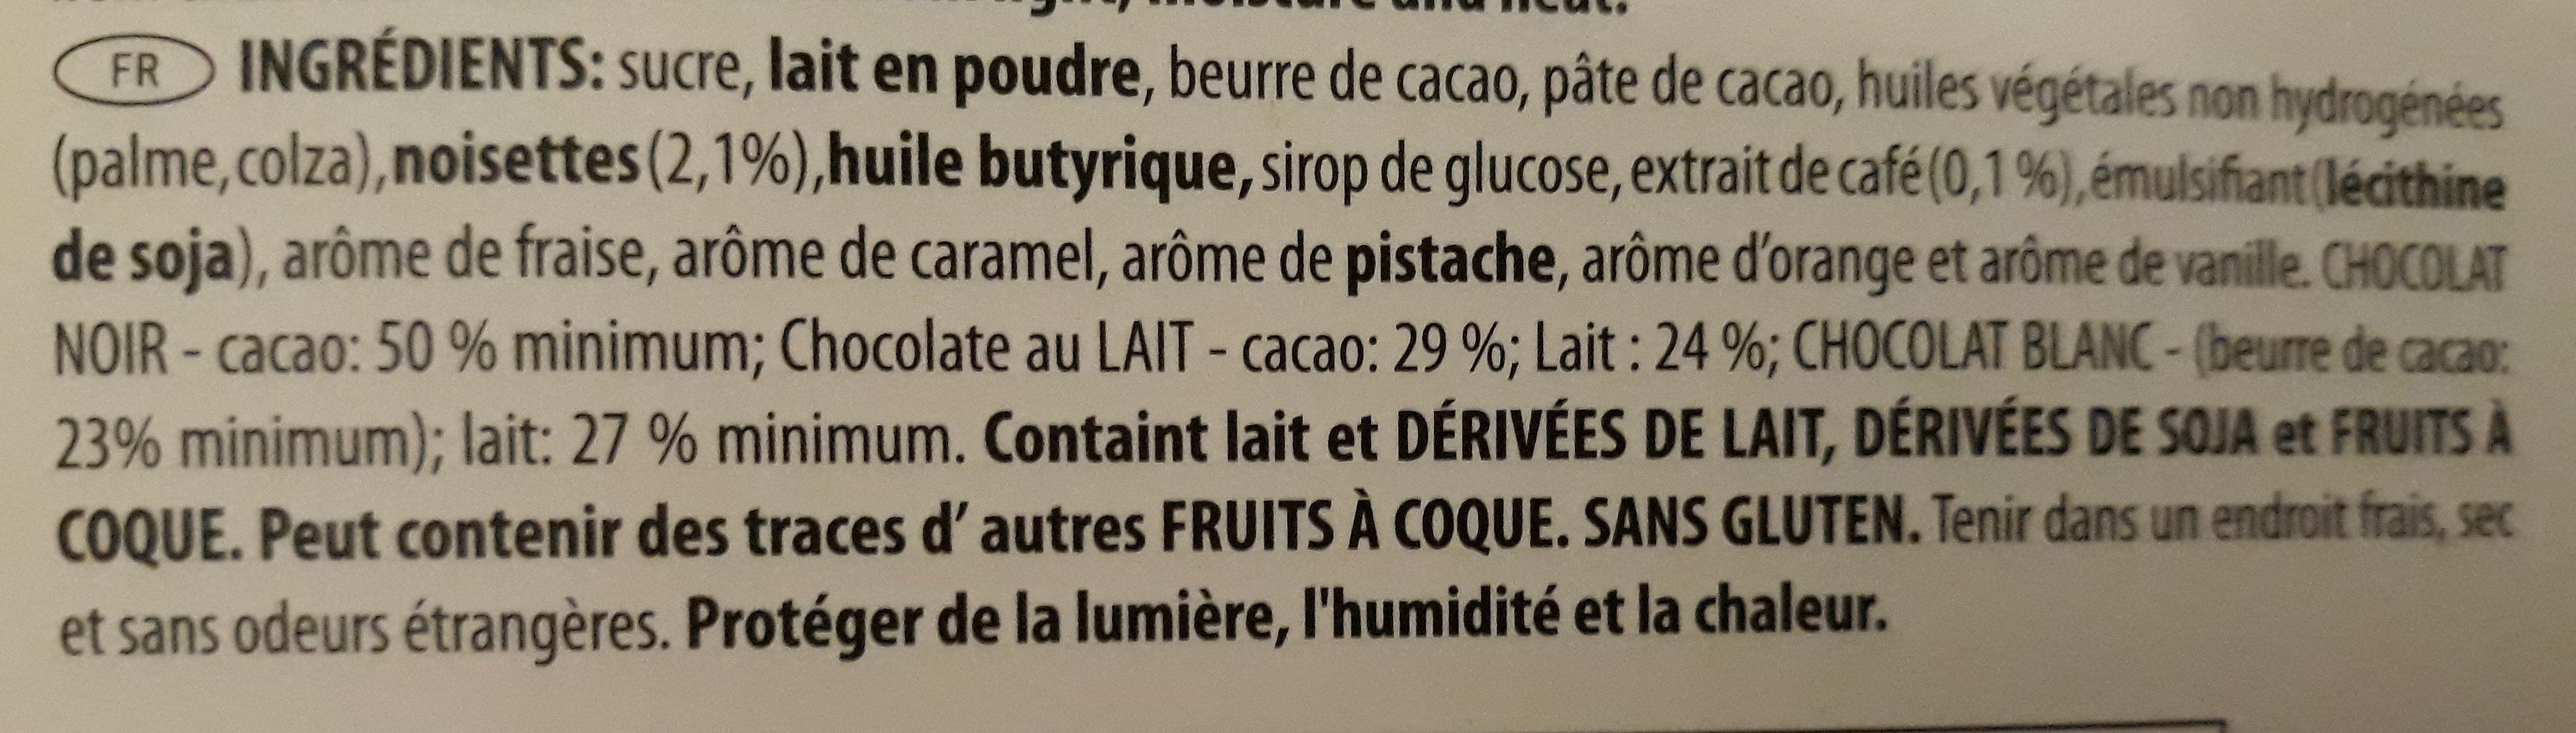 belgian chocolates - Ingrédients - fr